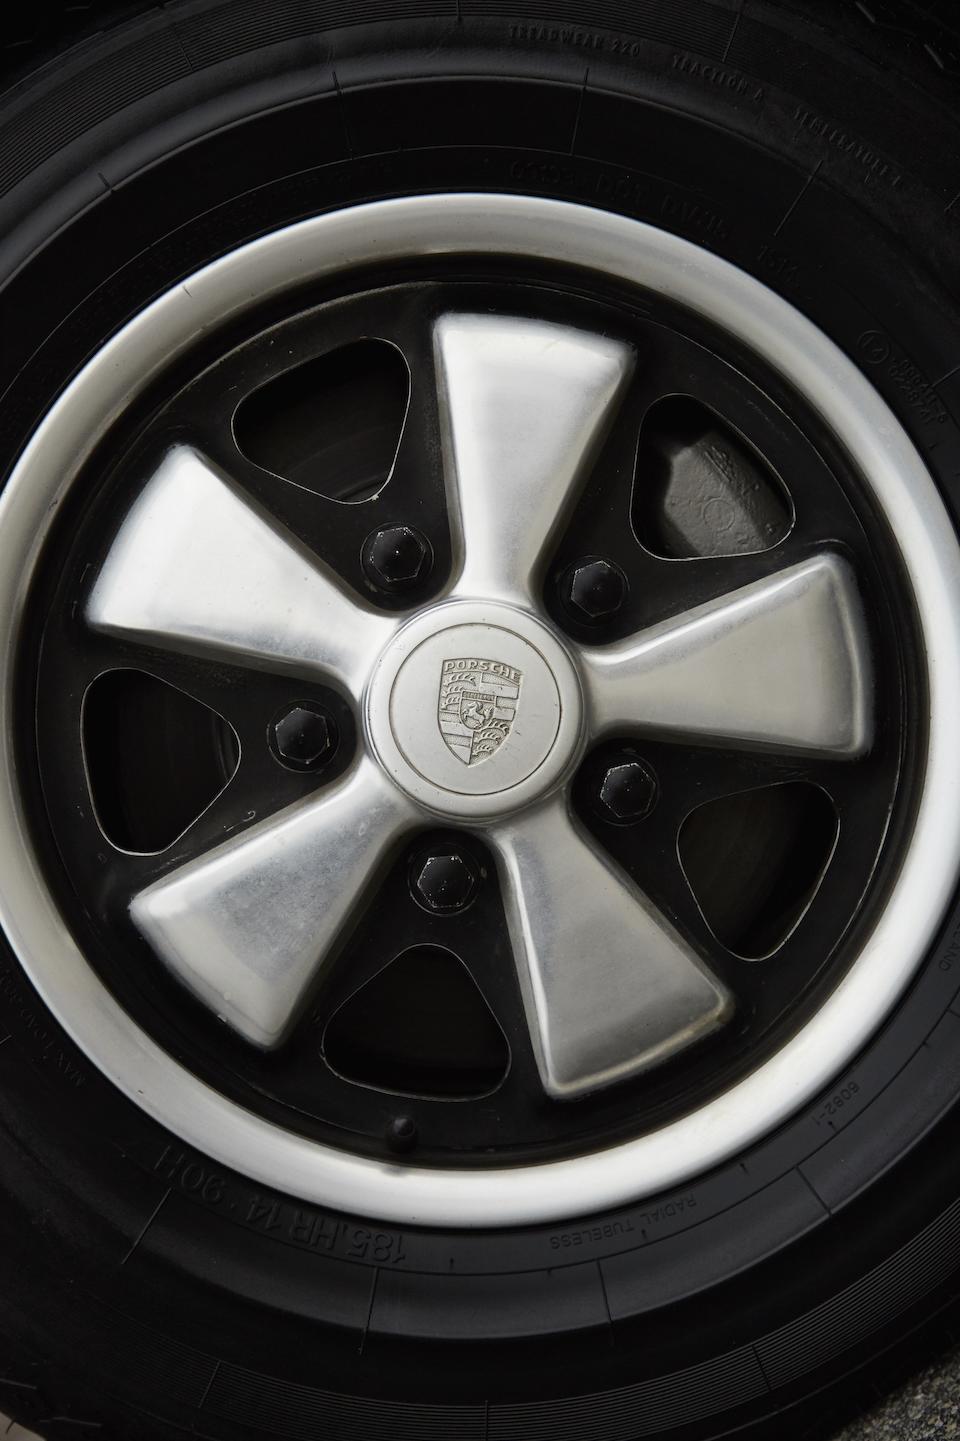 1970 Porsche 911T 2.2 Coupe  Chassis no. 911 010 1397 Engine no. 6108859